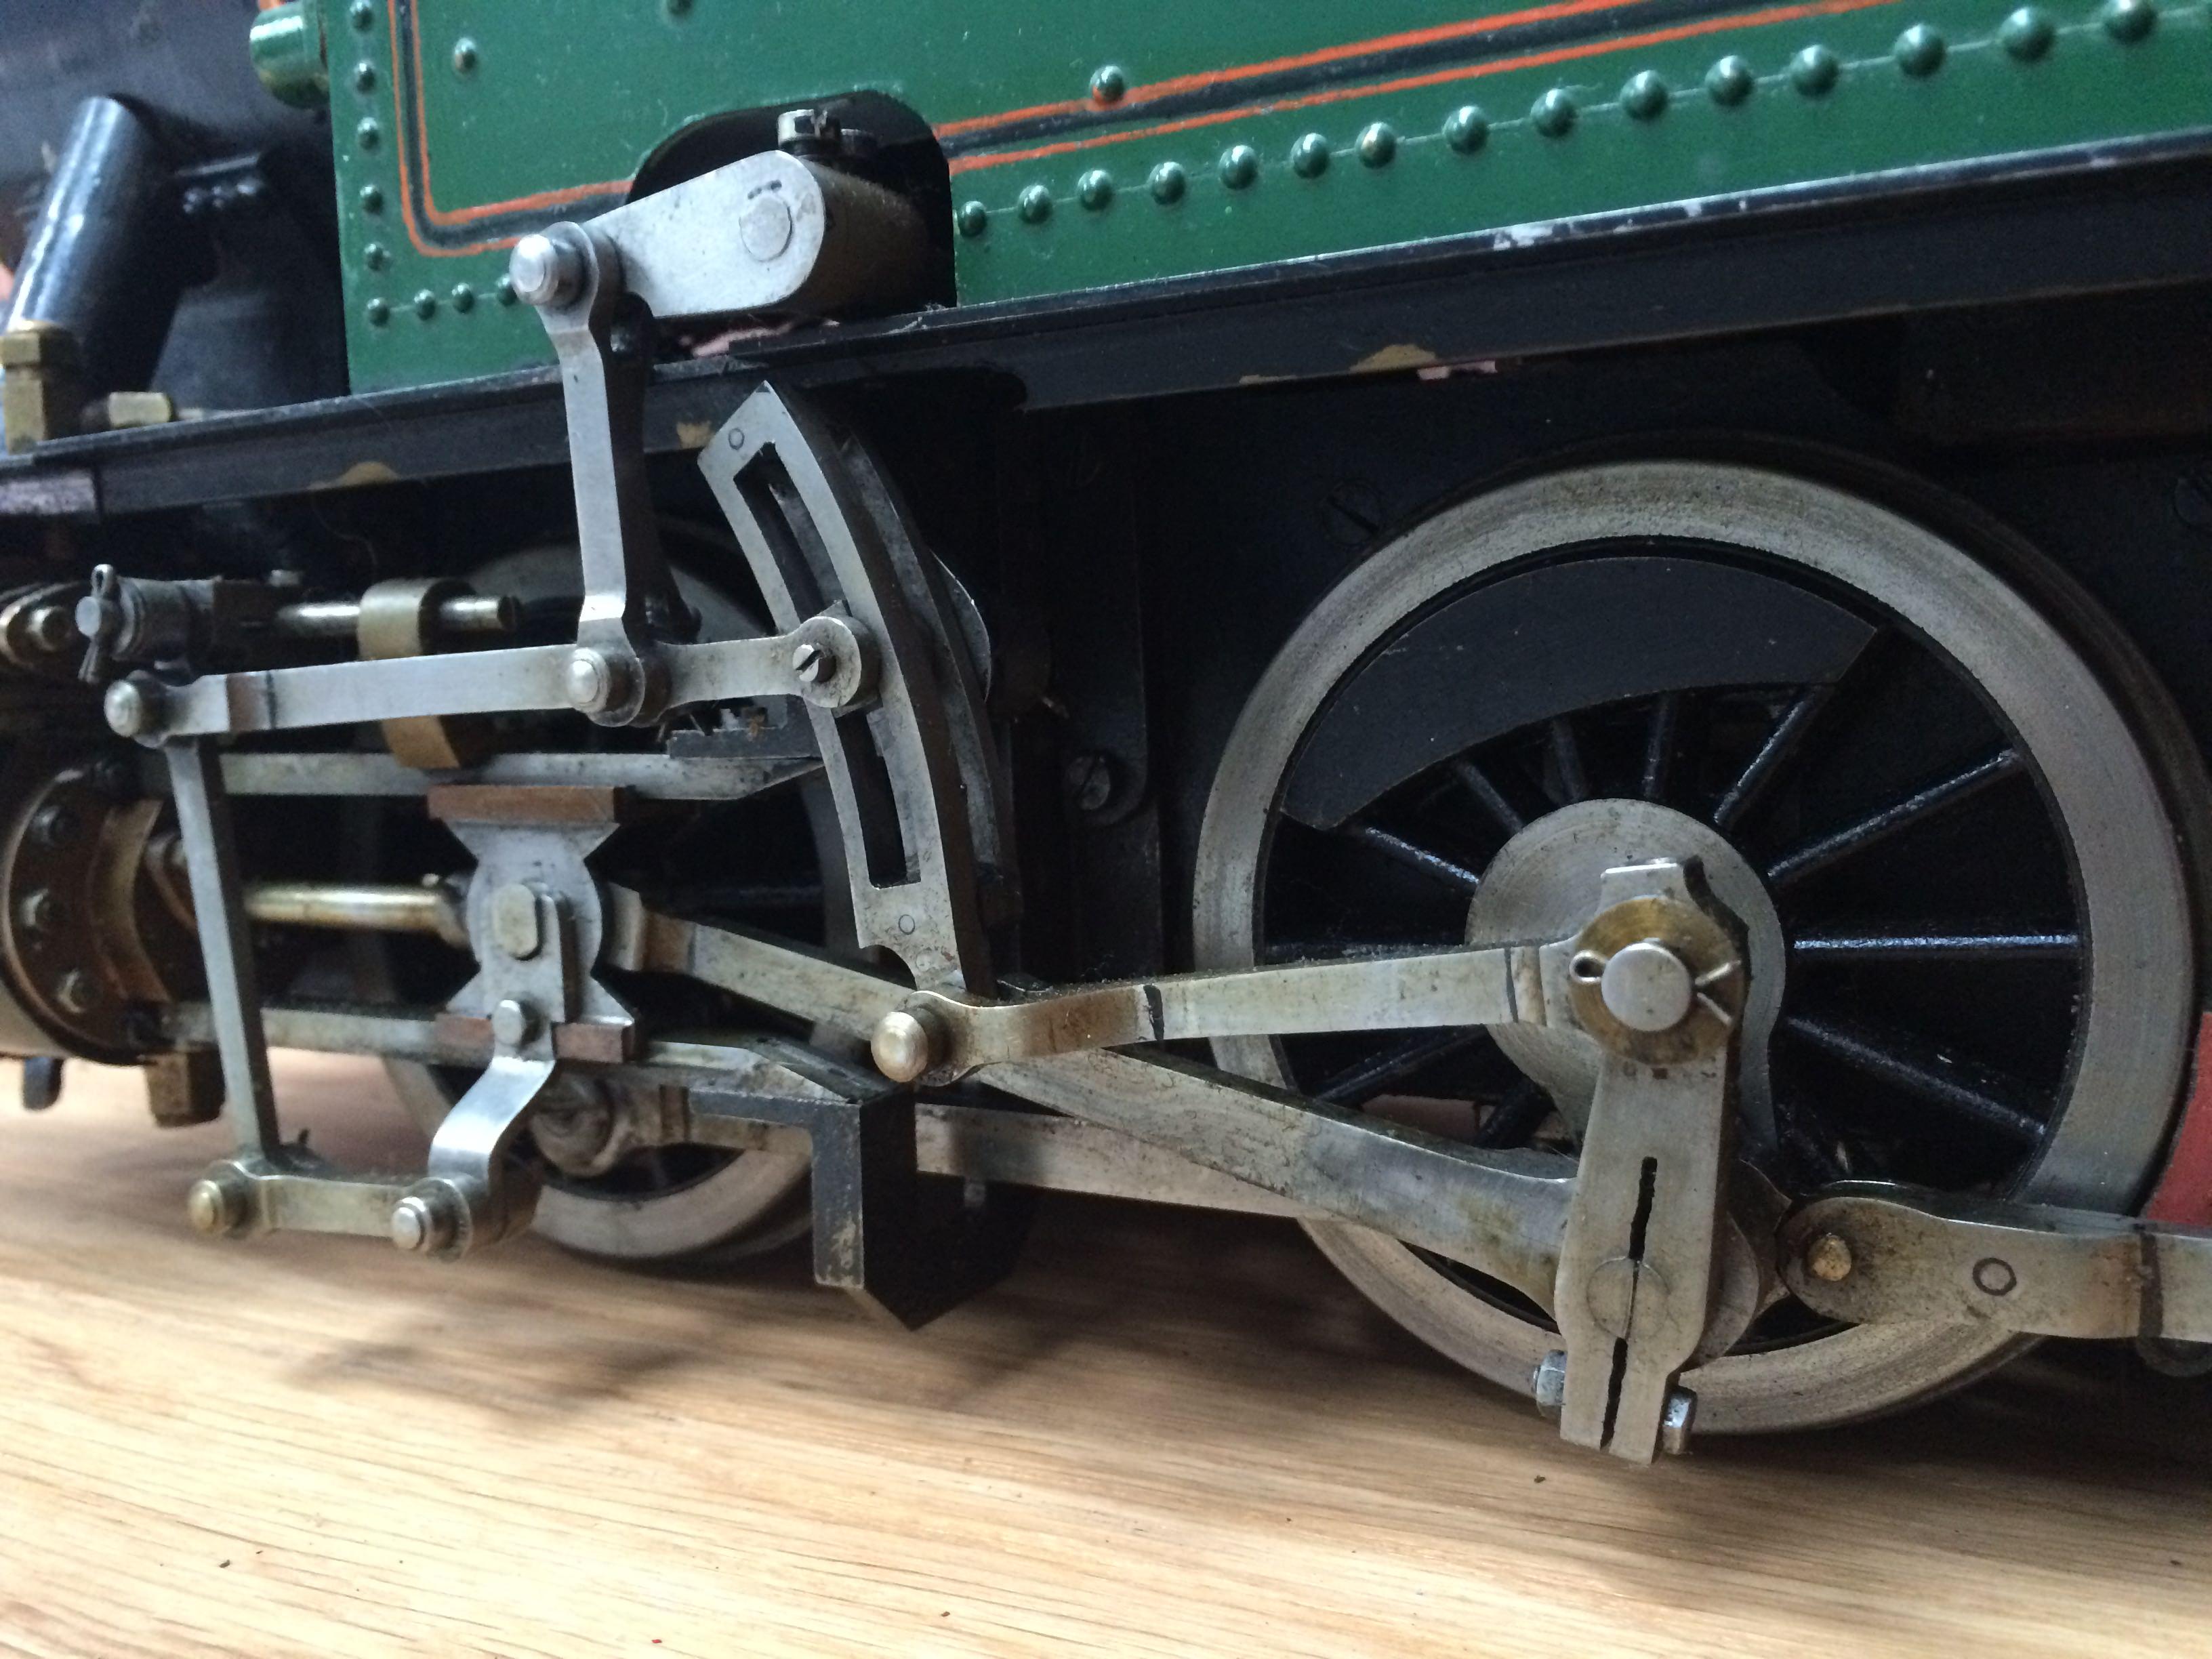 test 3 inch gauge freelance live steam tank engine for sale 04